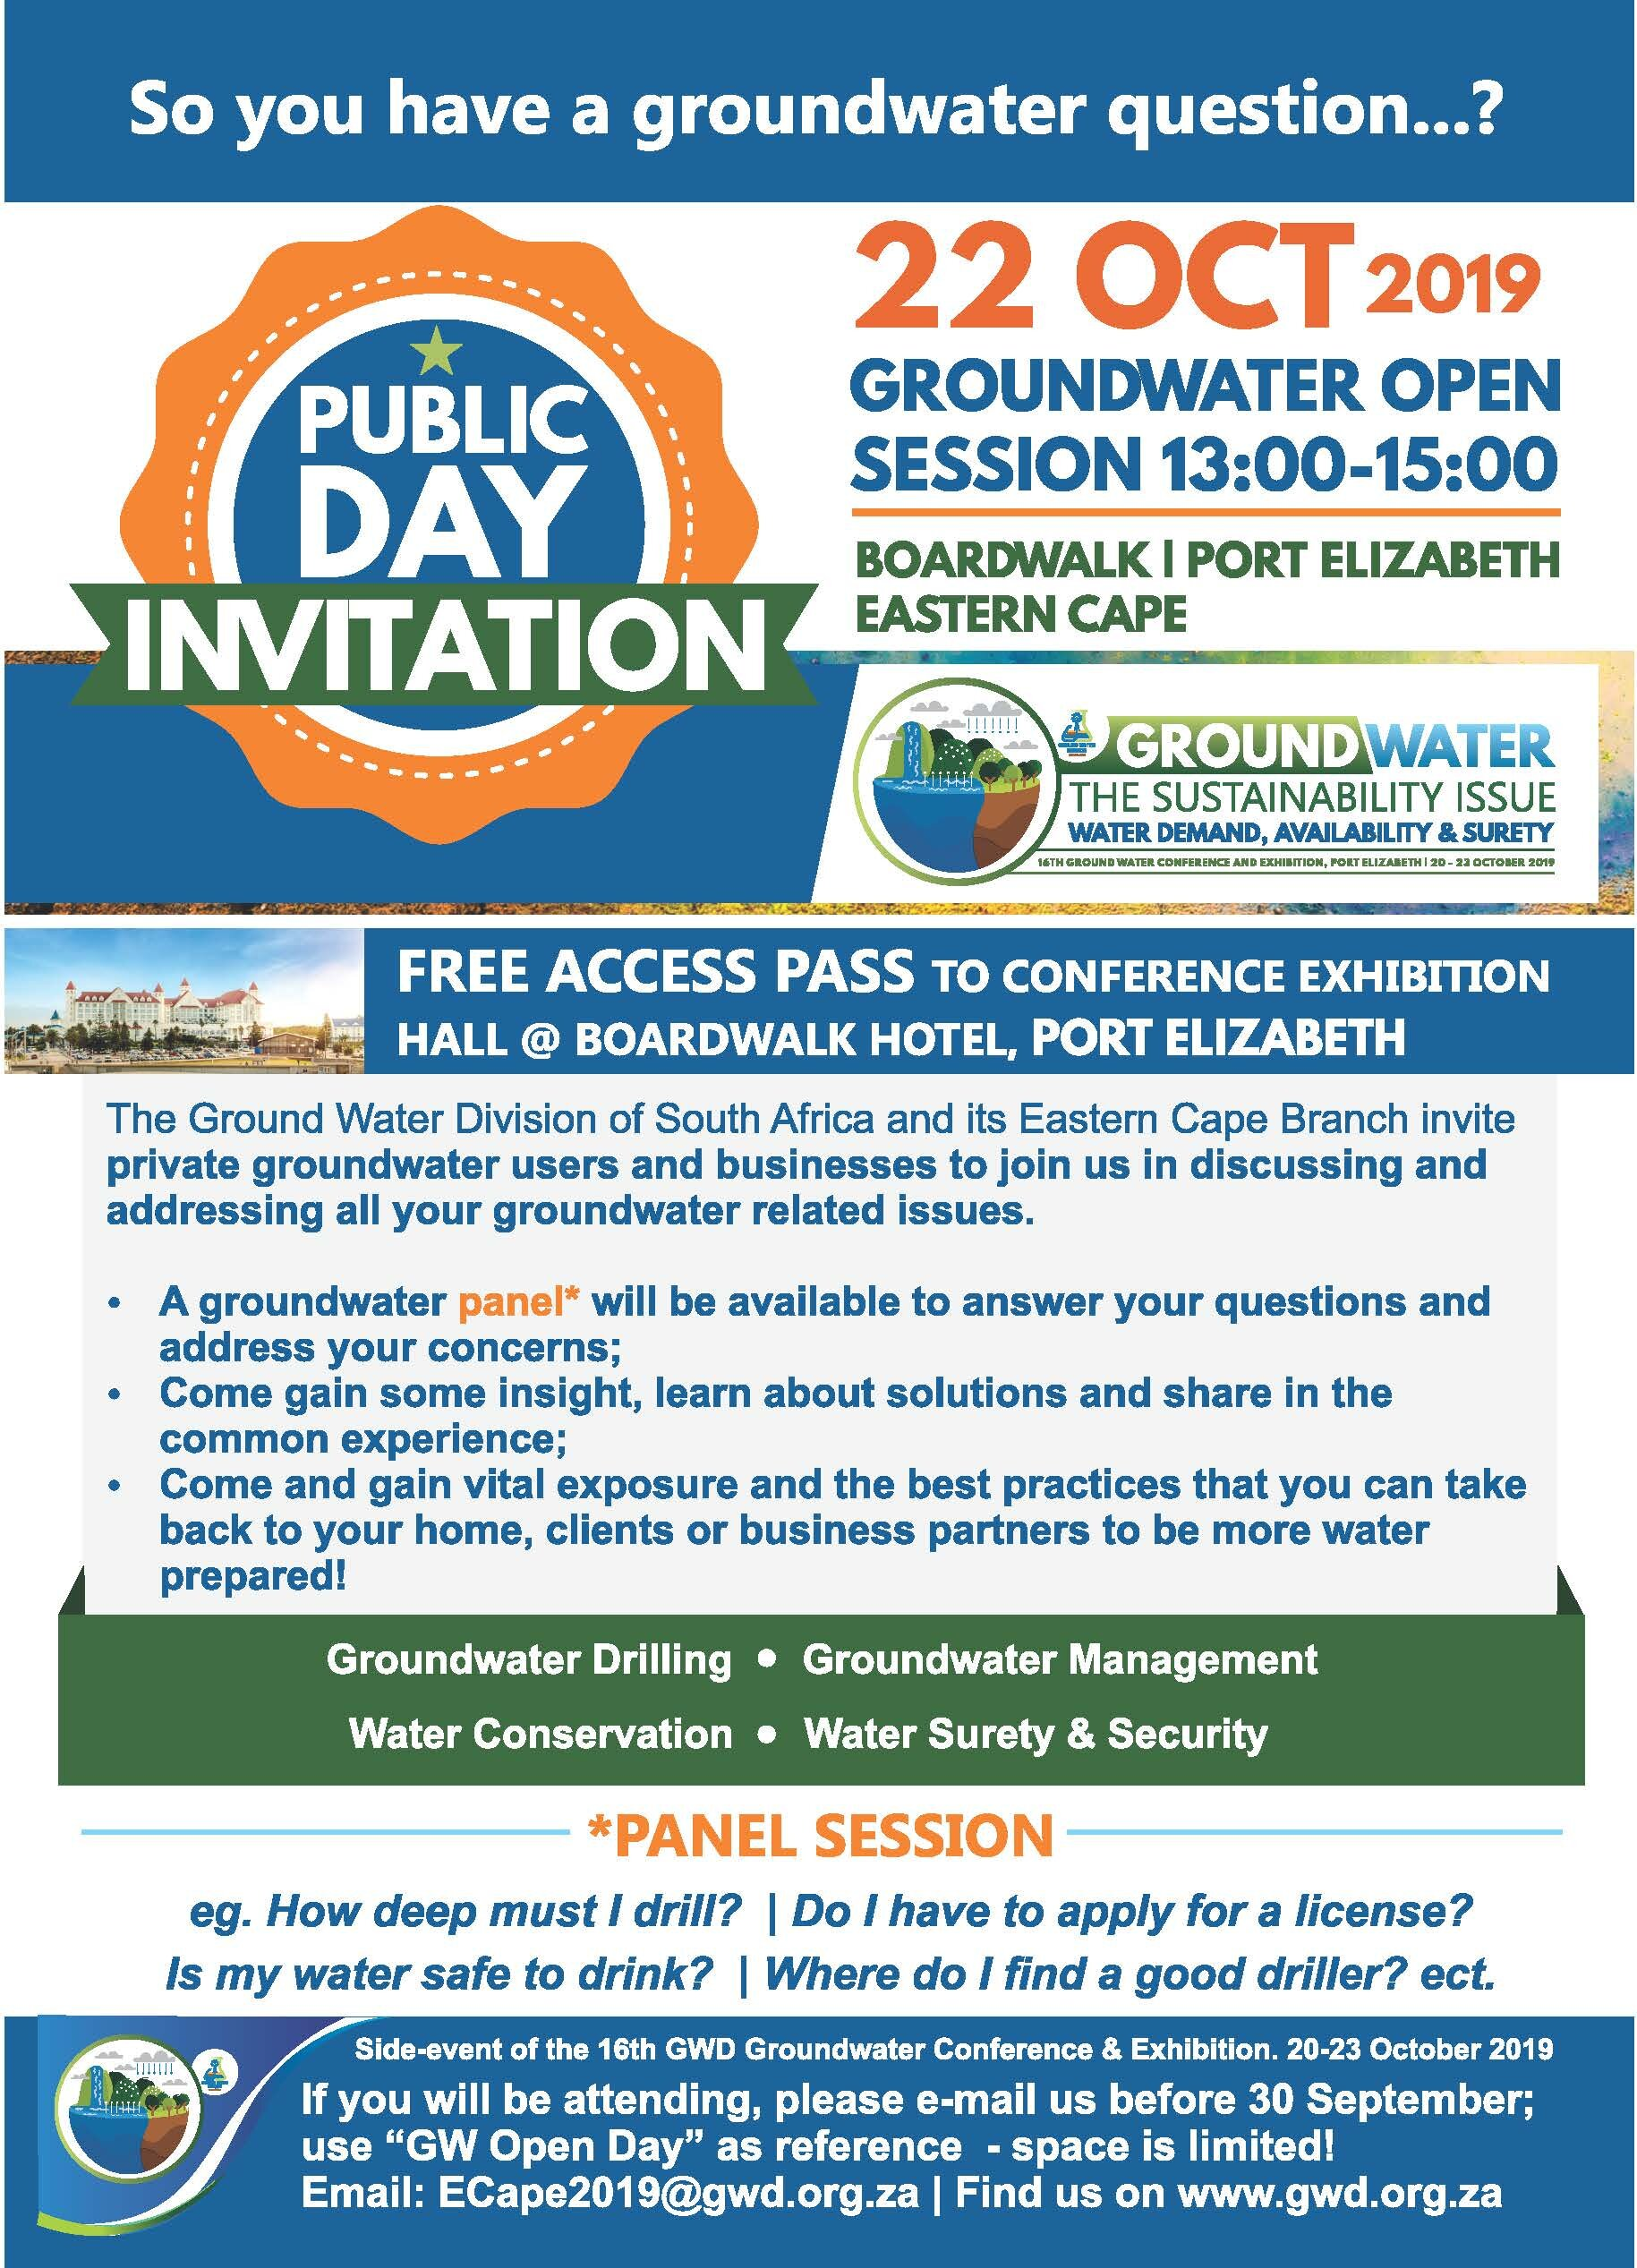 A5_Public Day flyer.jpg